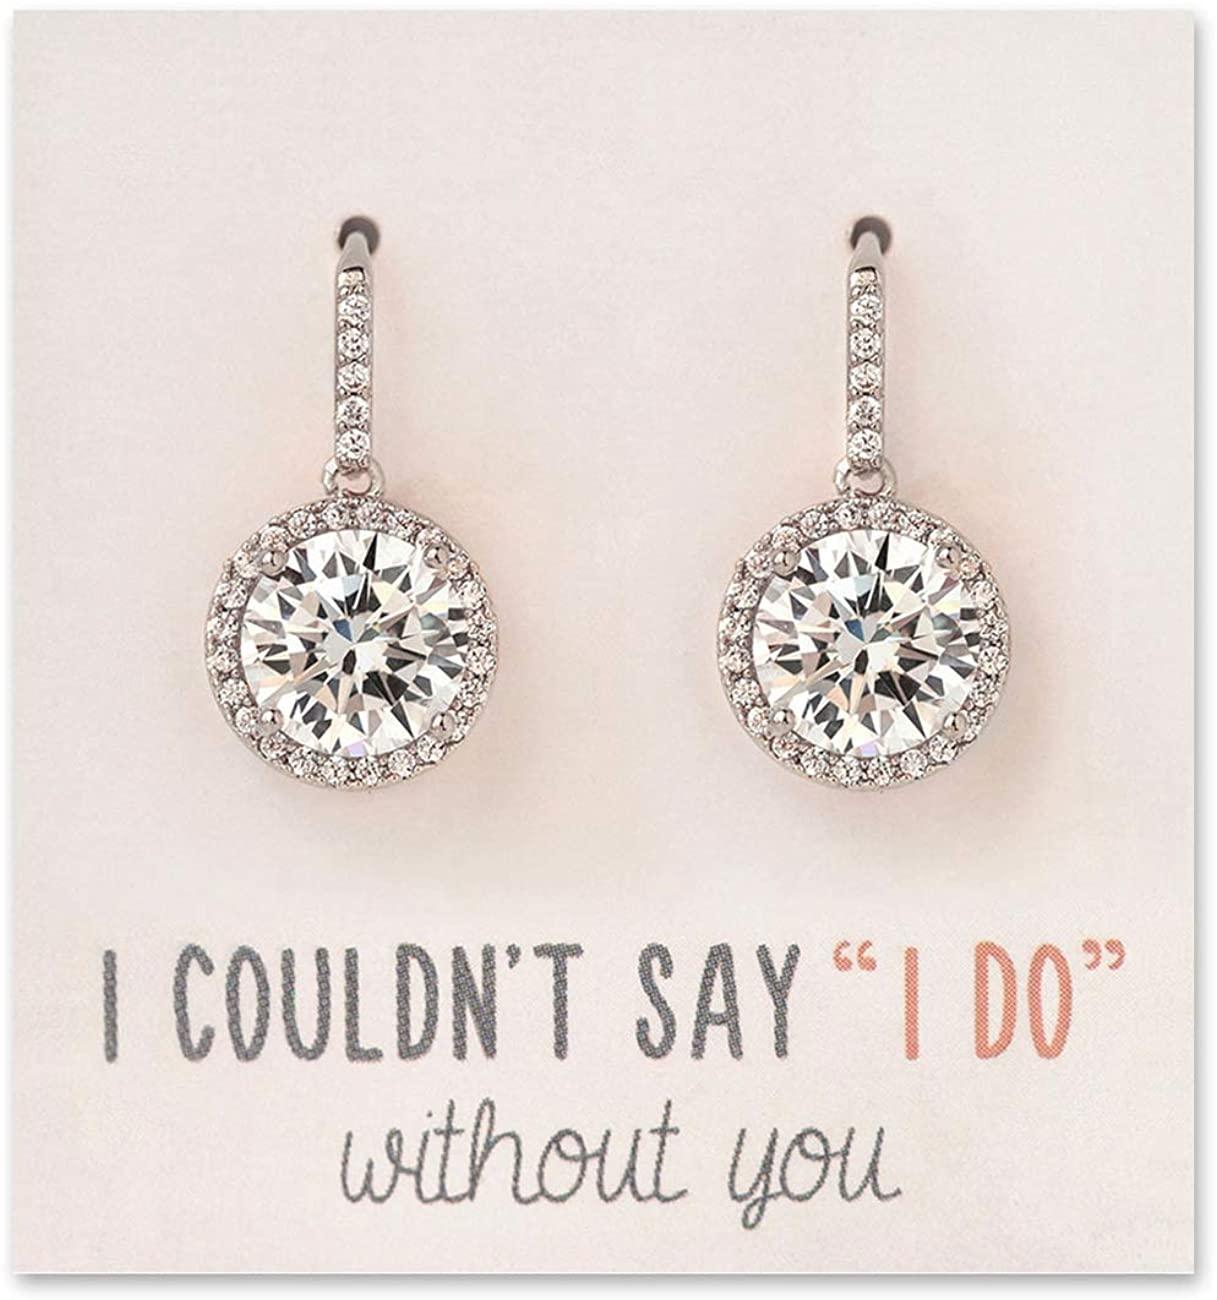 A+O Wedding Bridesmaid Earrings Gift, Cubic Zirconia Drop Dangle Earrings in Silver, Gold, Rose Gold